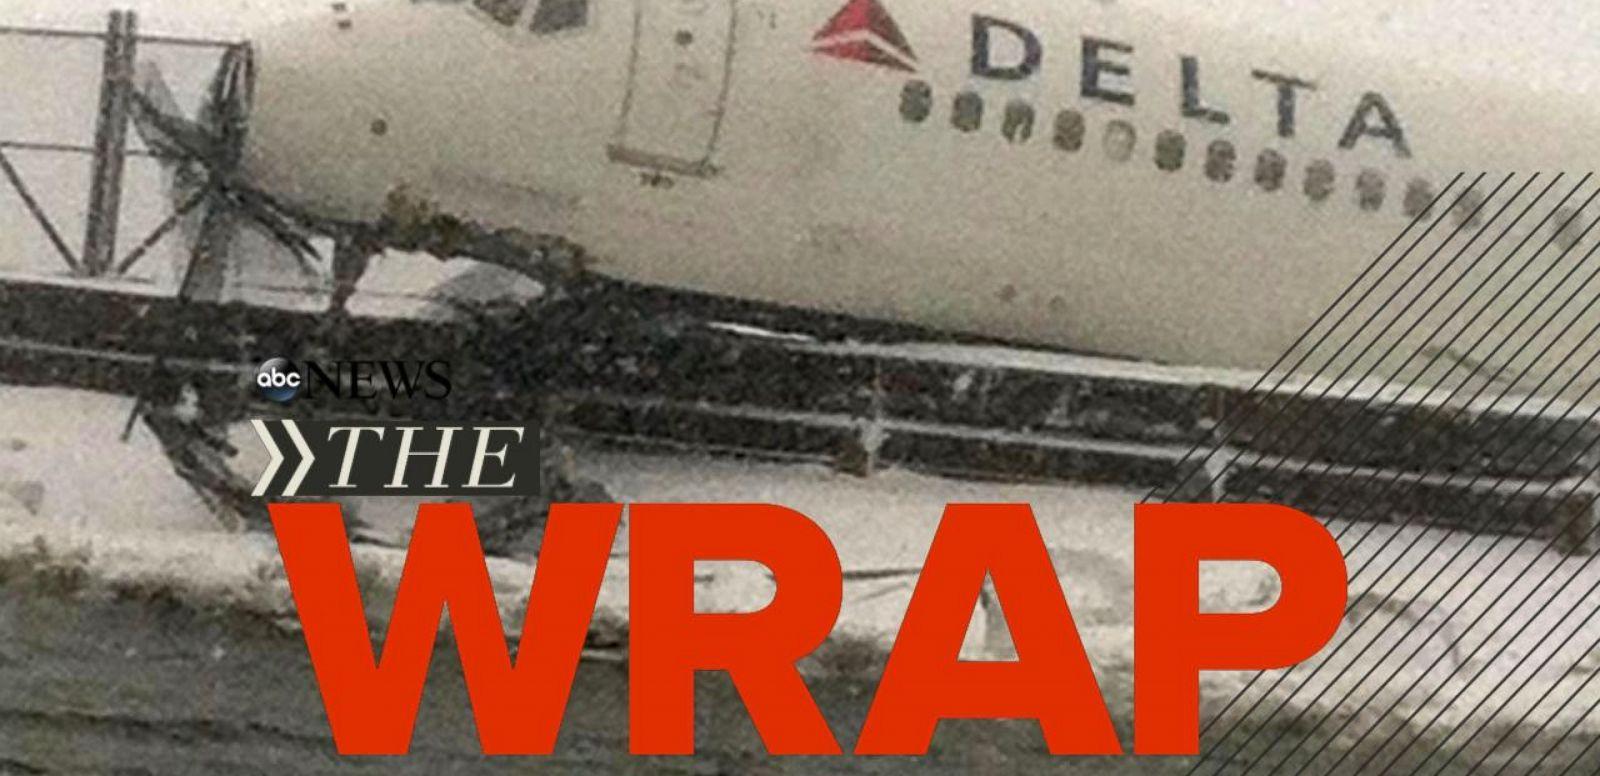 VIDEO: Delta Plane Skids Off Runway at LGA; Michael Brown's Family to File Civil Suit; Jury Hung in Jodi Arias Trial